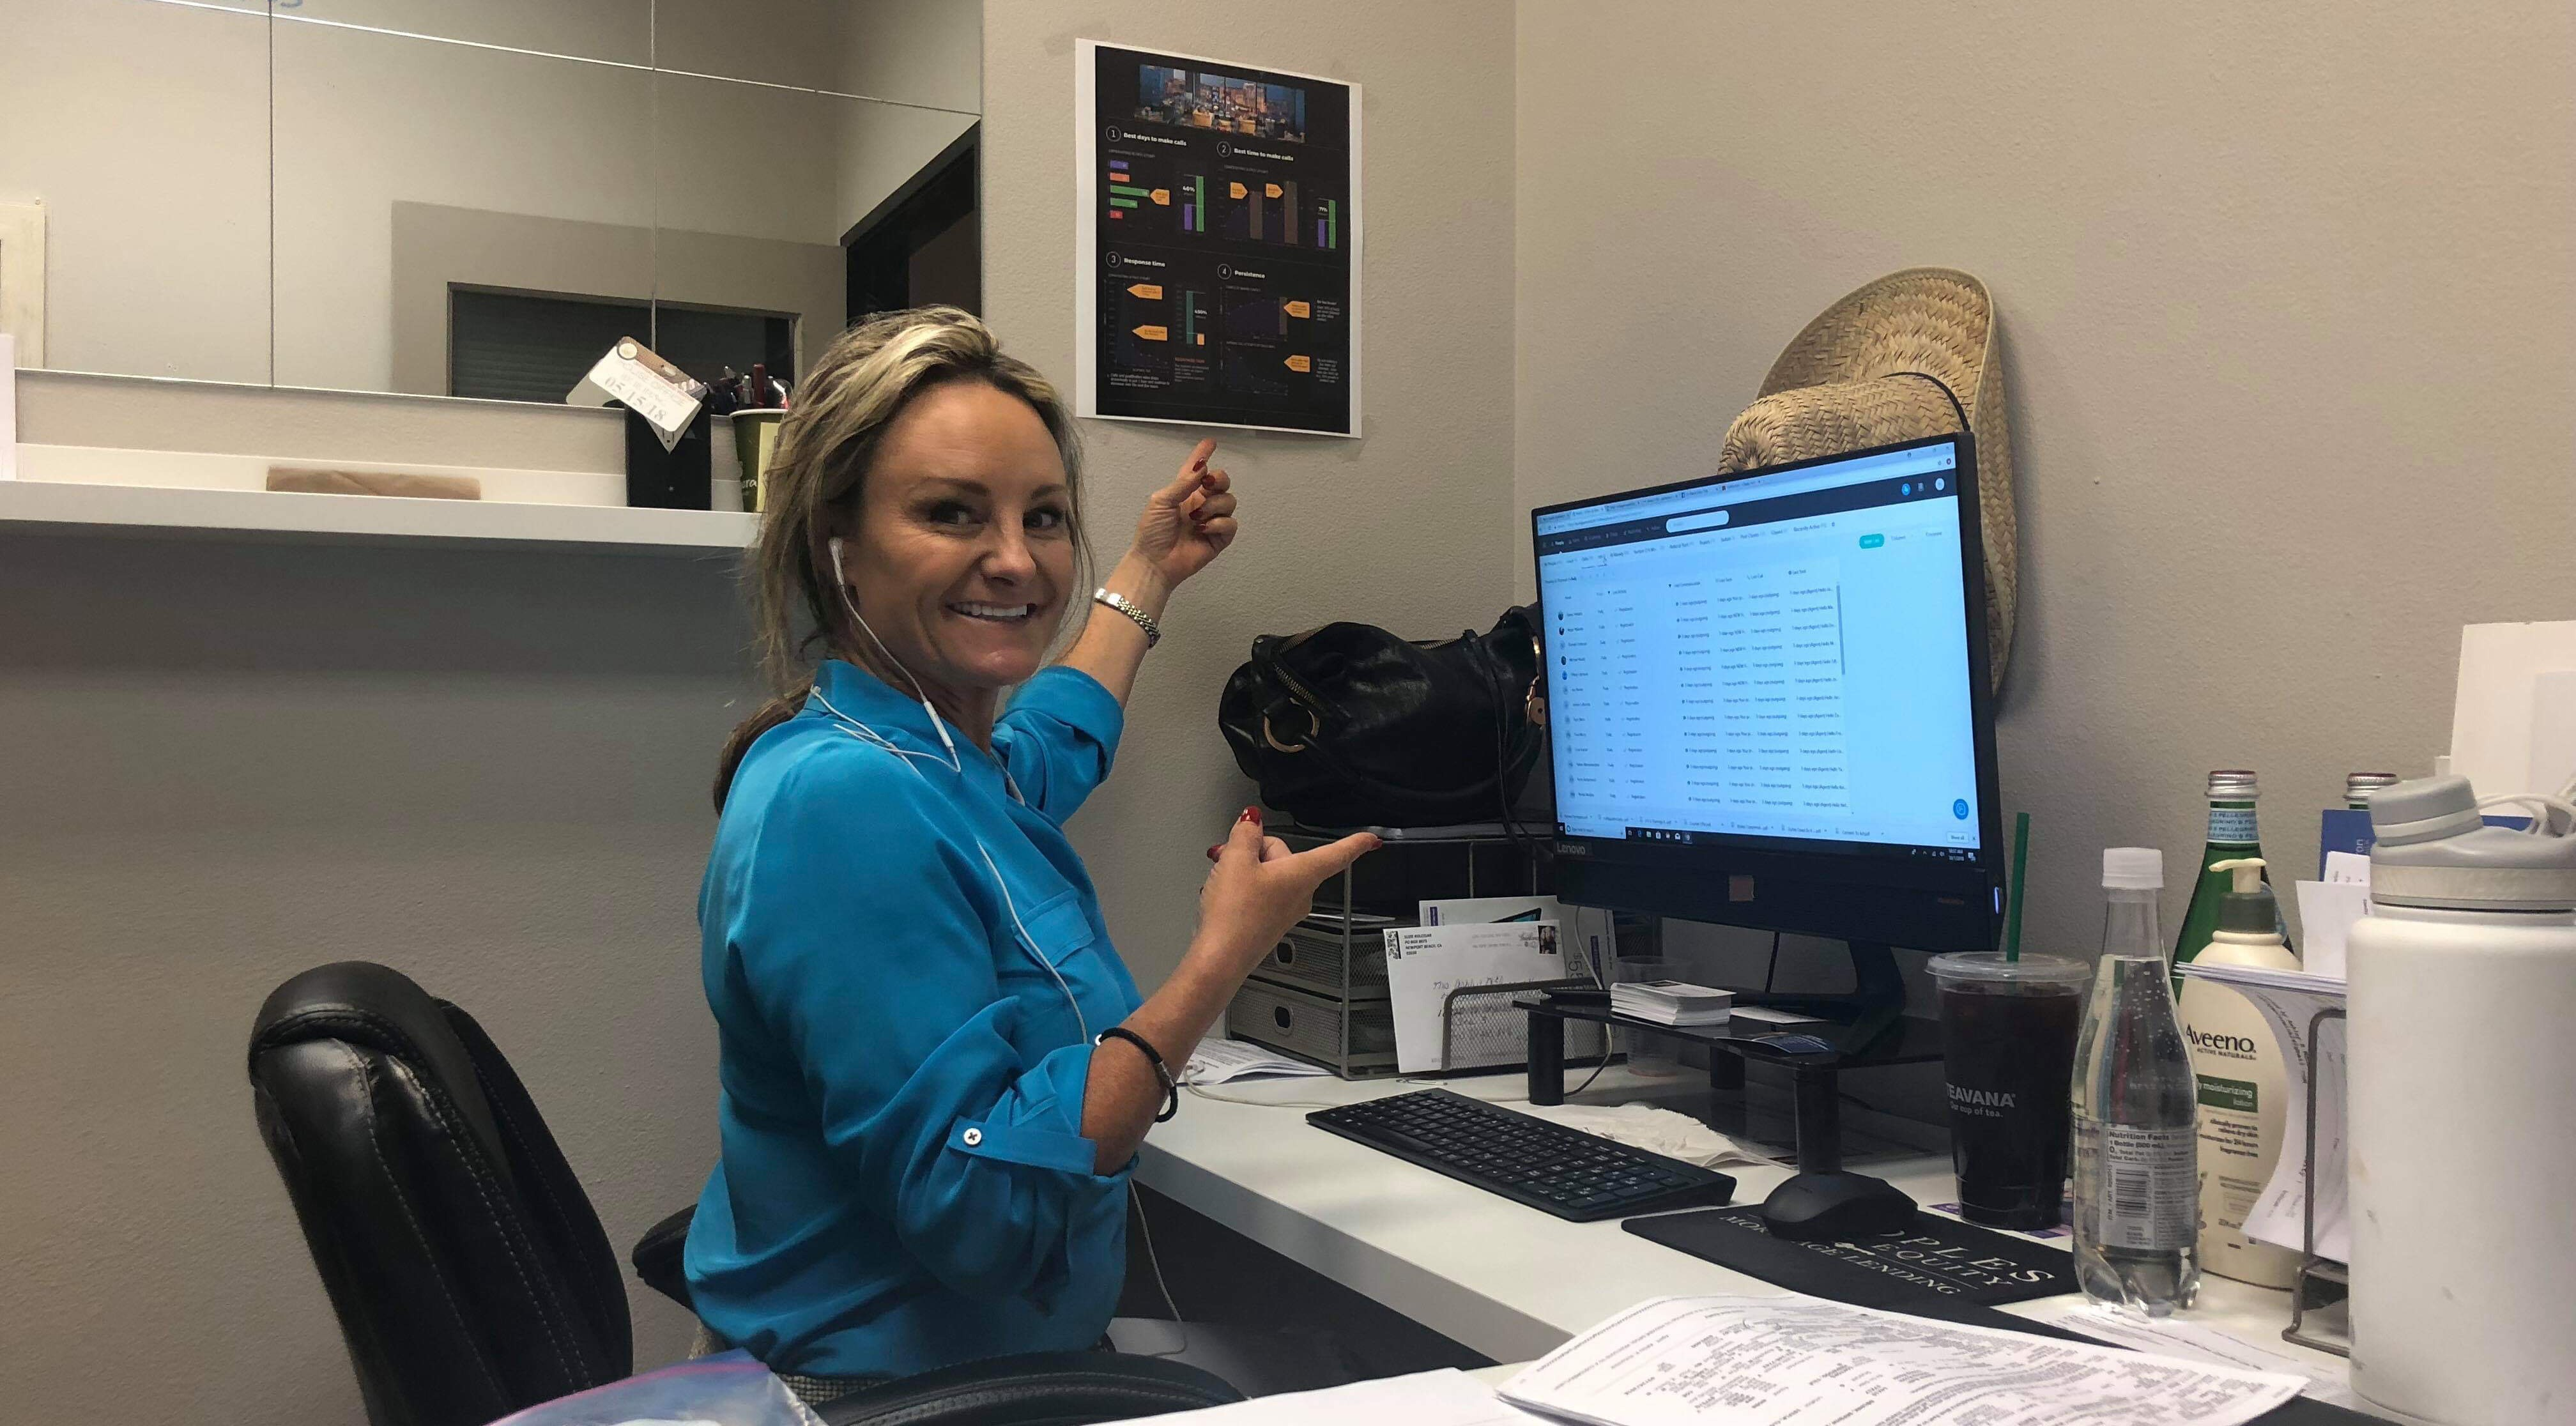 Ashley McCormick Las Vegas Office